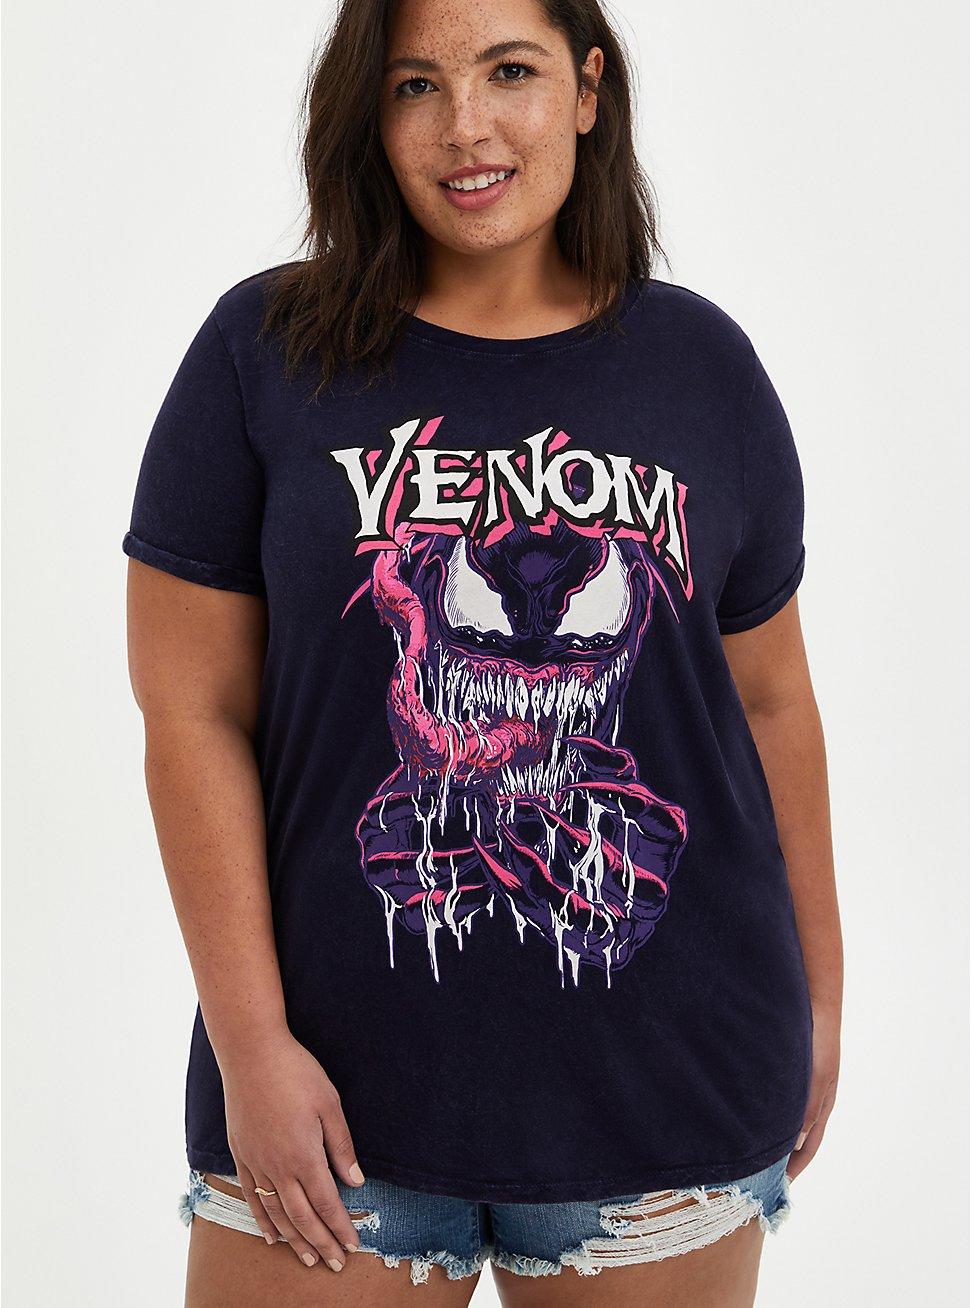 Plus Size Marvel Venom Mineral Wash Crew Top, PEACOAT, hi-res